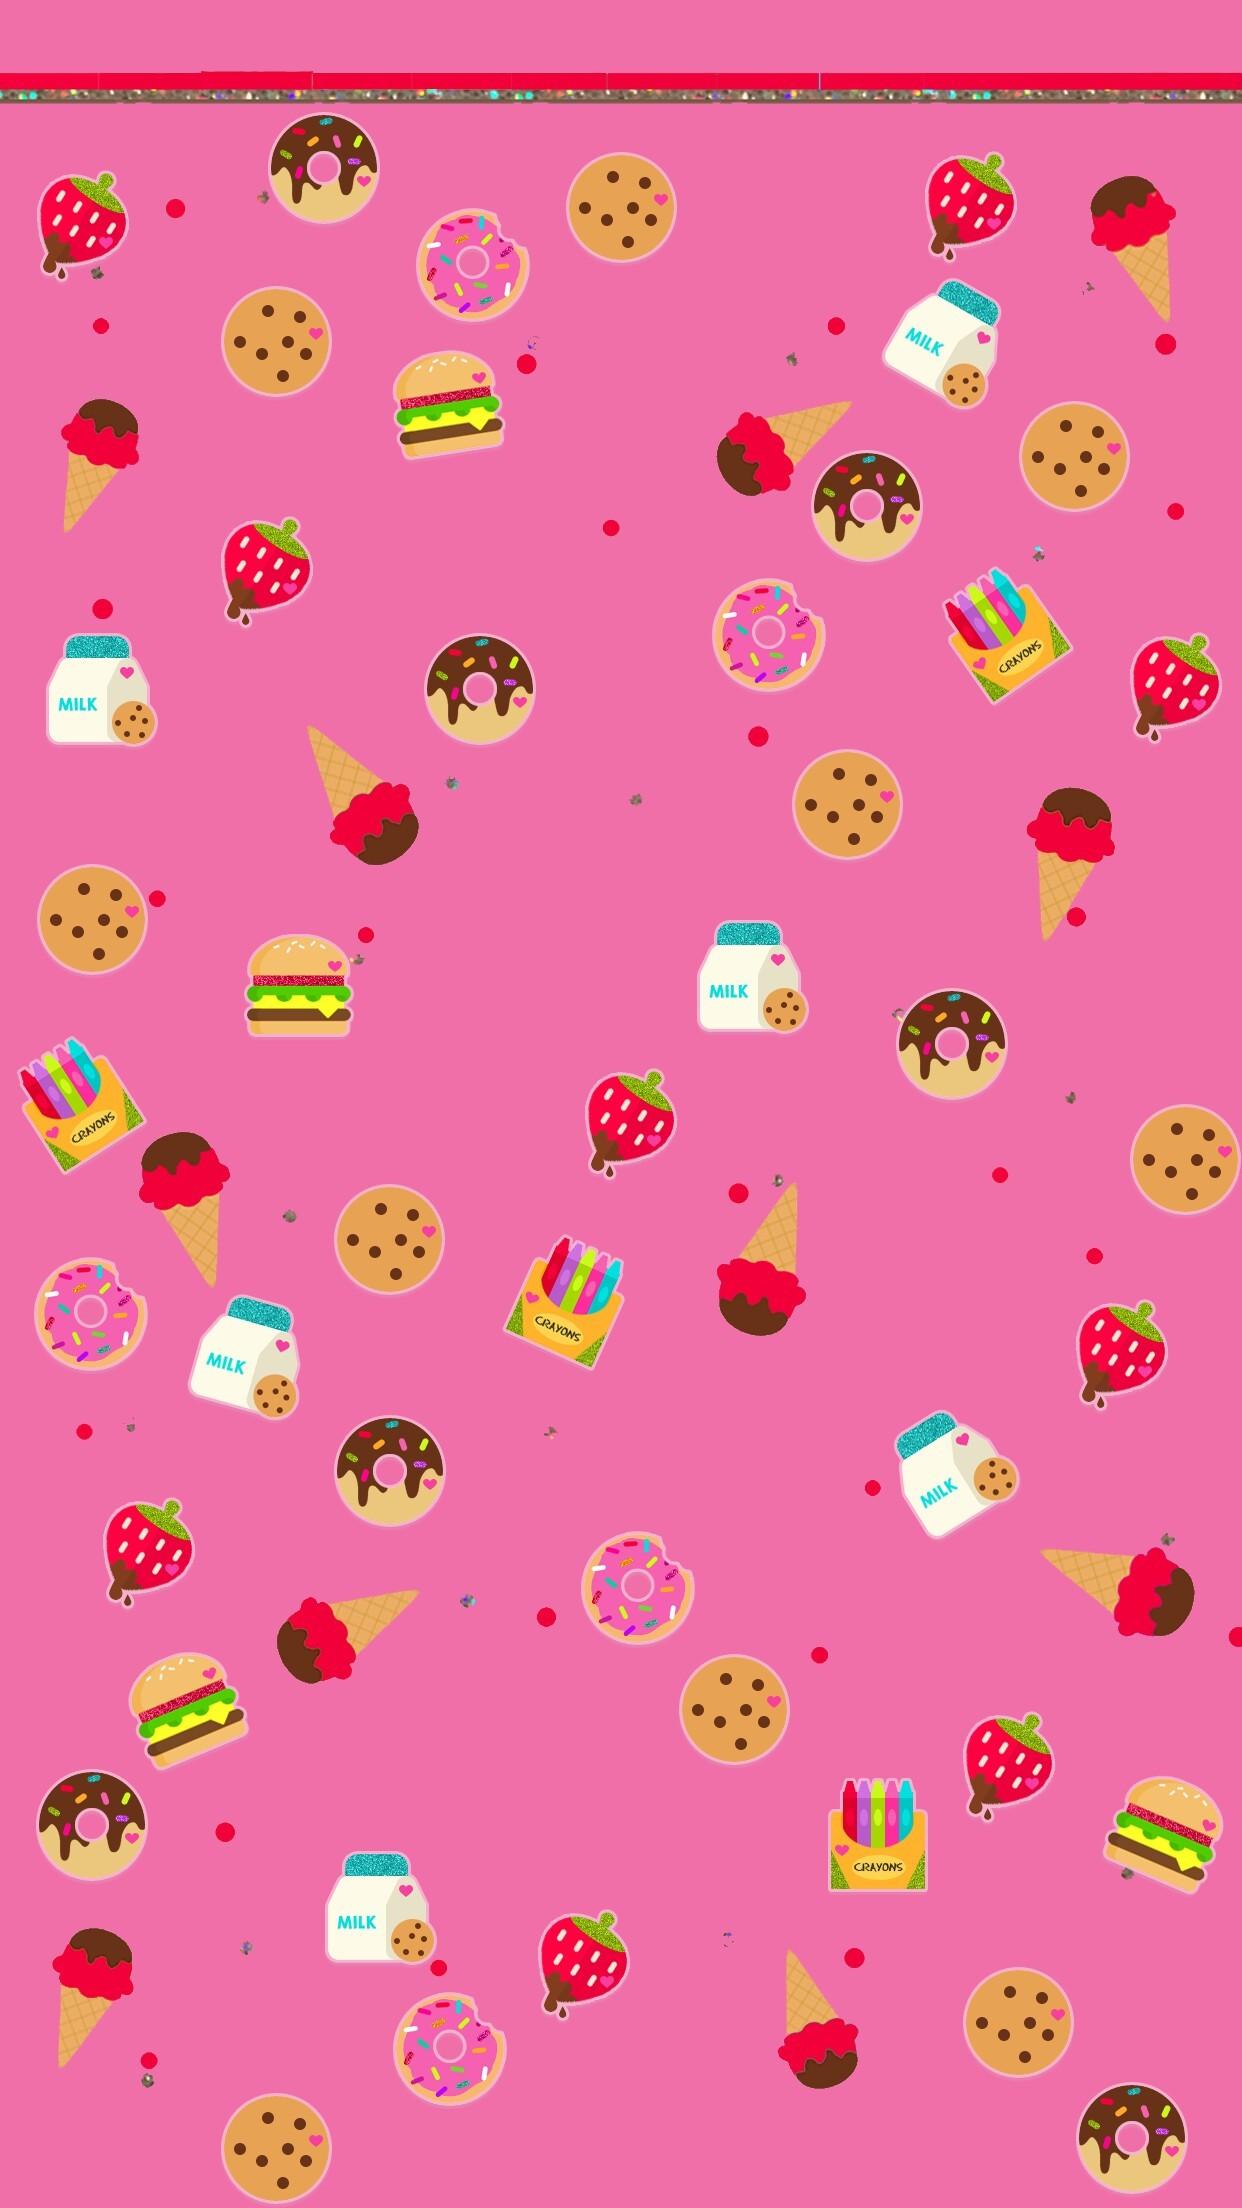 1280x2272 Kawaii Illustration Wallpaper Cute Things Stuff Desktop Wallpapers Iphone Sweet Tooth Bunnies